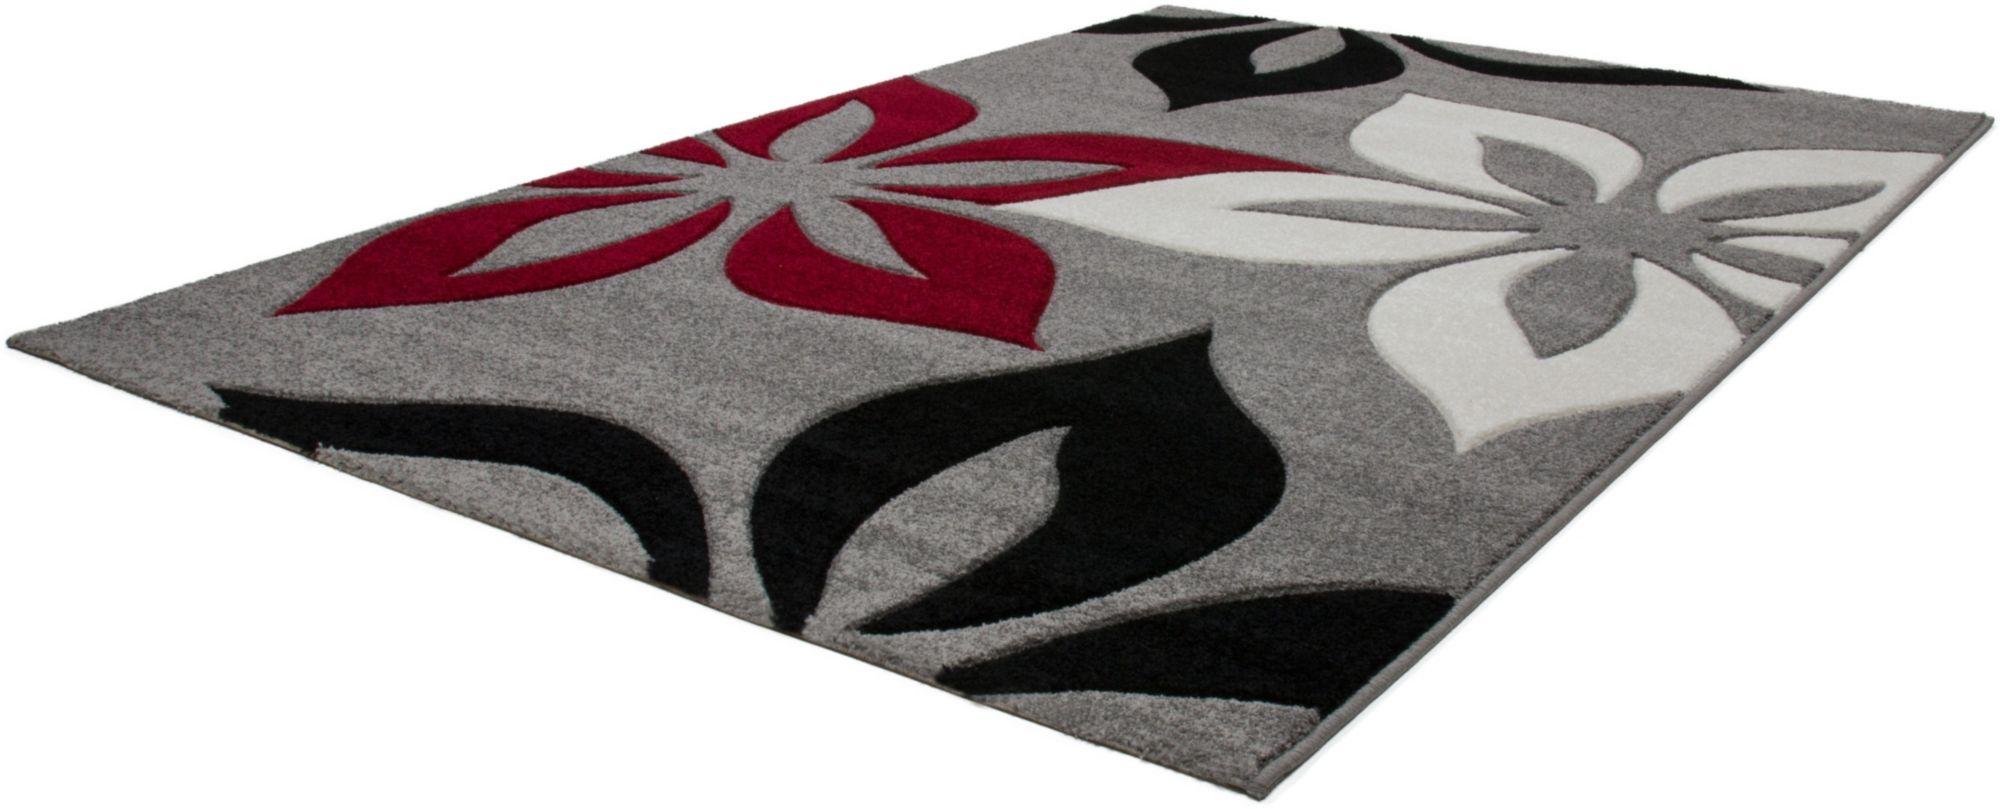 Teppich, »Havanna 420«, Lalee, rechteckig, Höhe 15 mm, maschinell gewebt